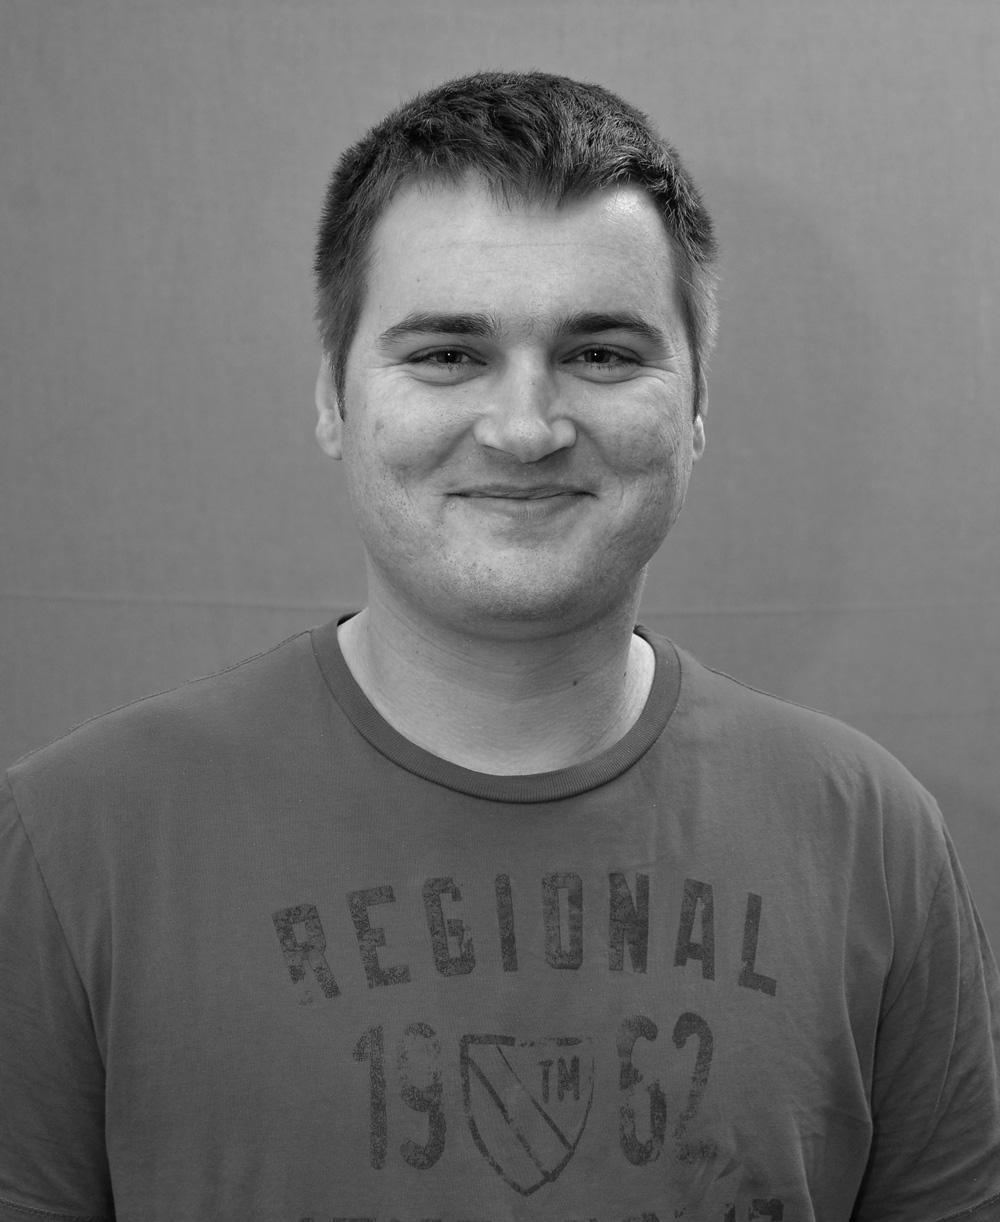 Marko Radojkovic